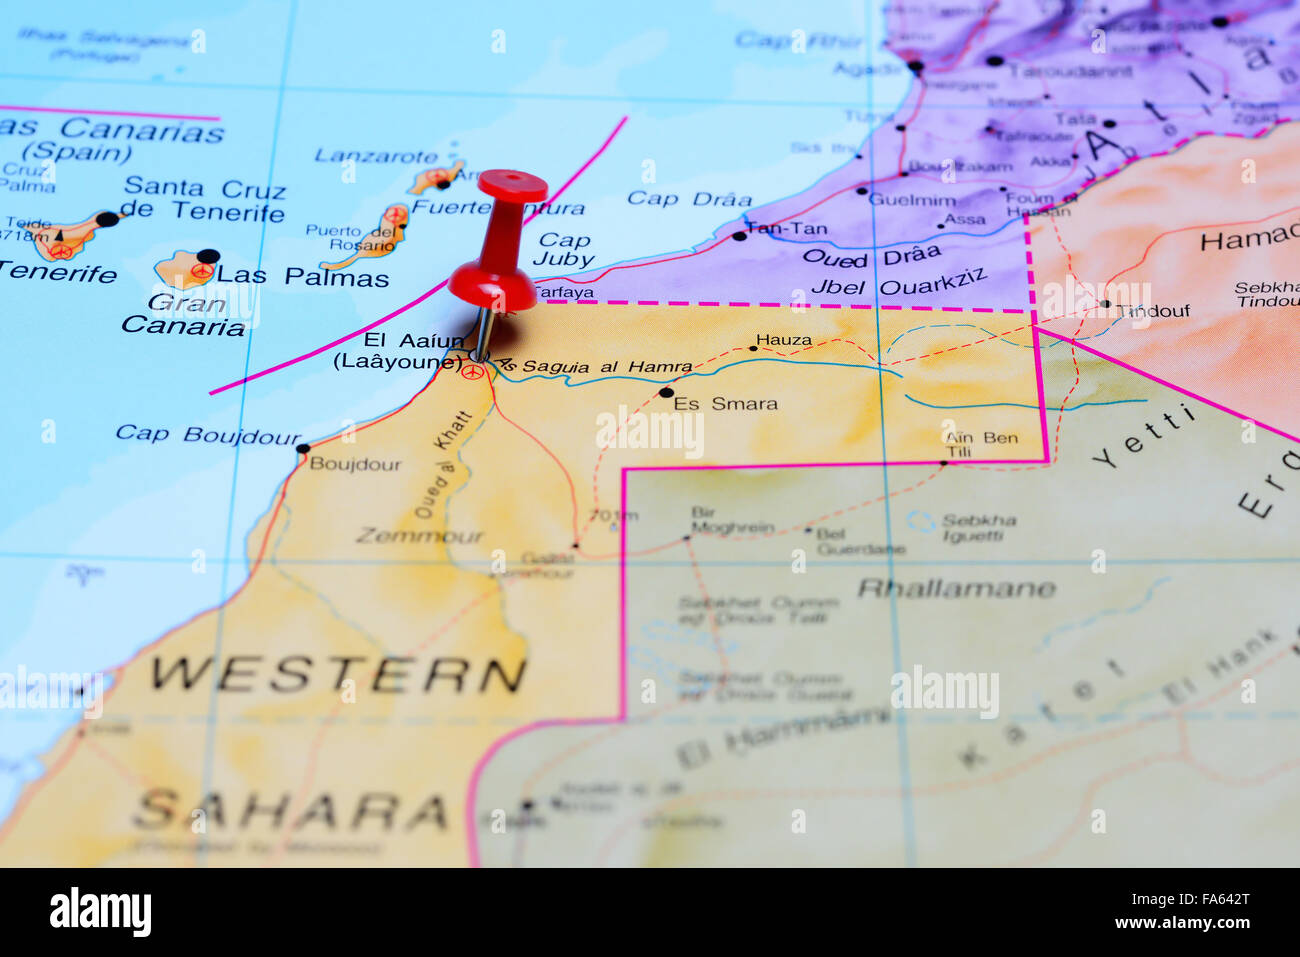 Laayoune Western Sahara Stock Photos Laayoune Western Sahara Stock